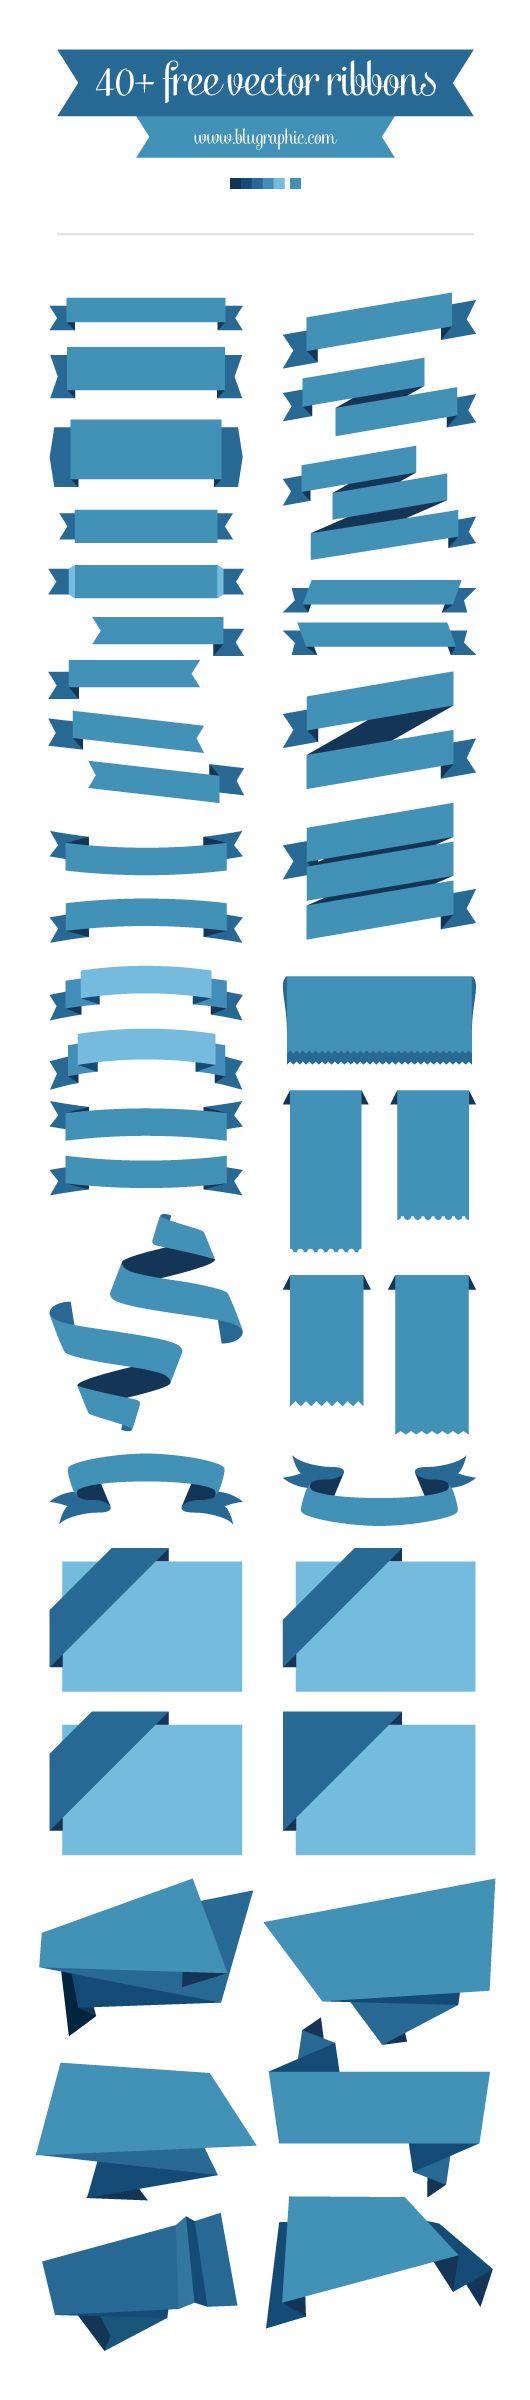 40+ Free Vector Ribbons!   #design